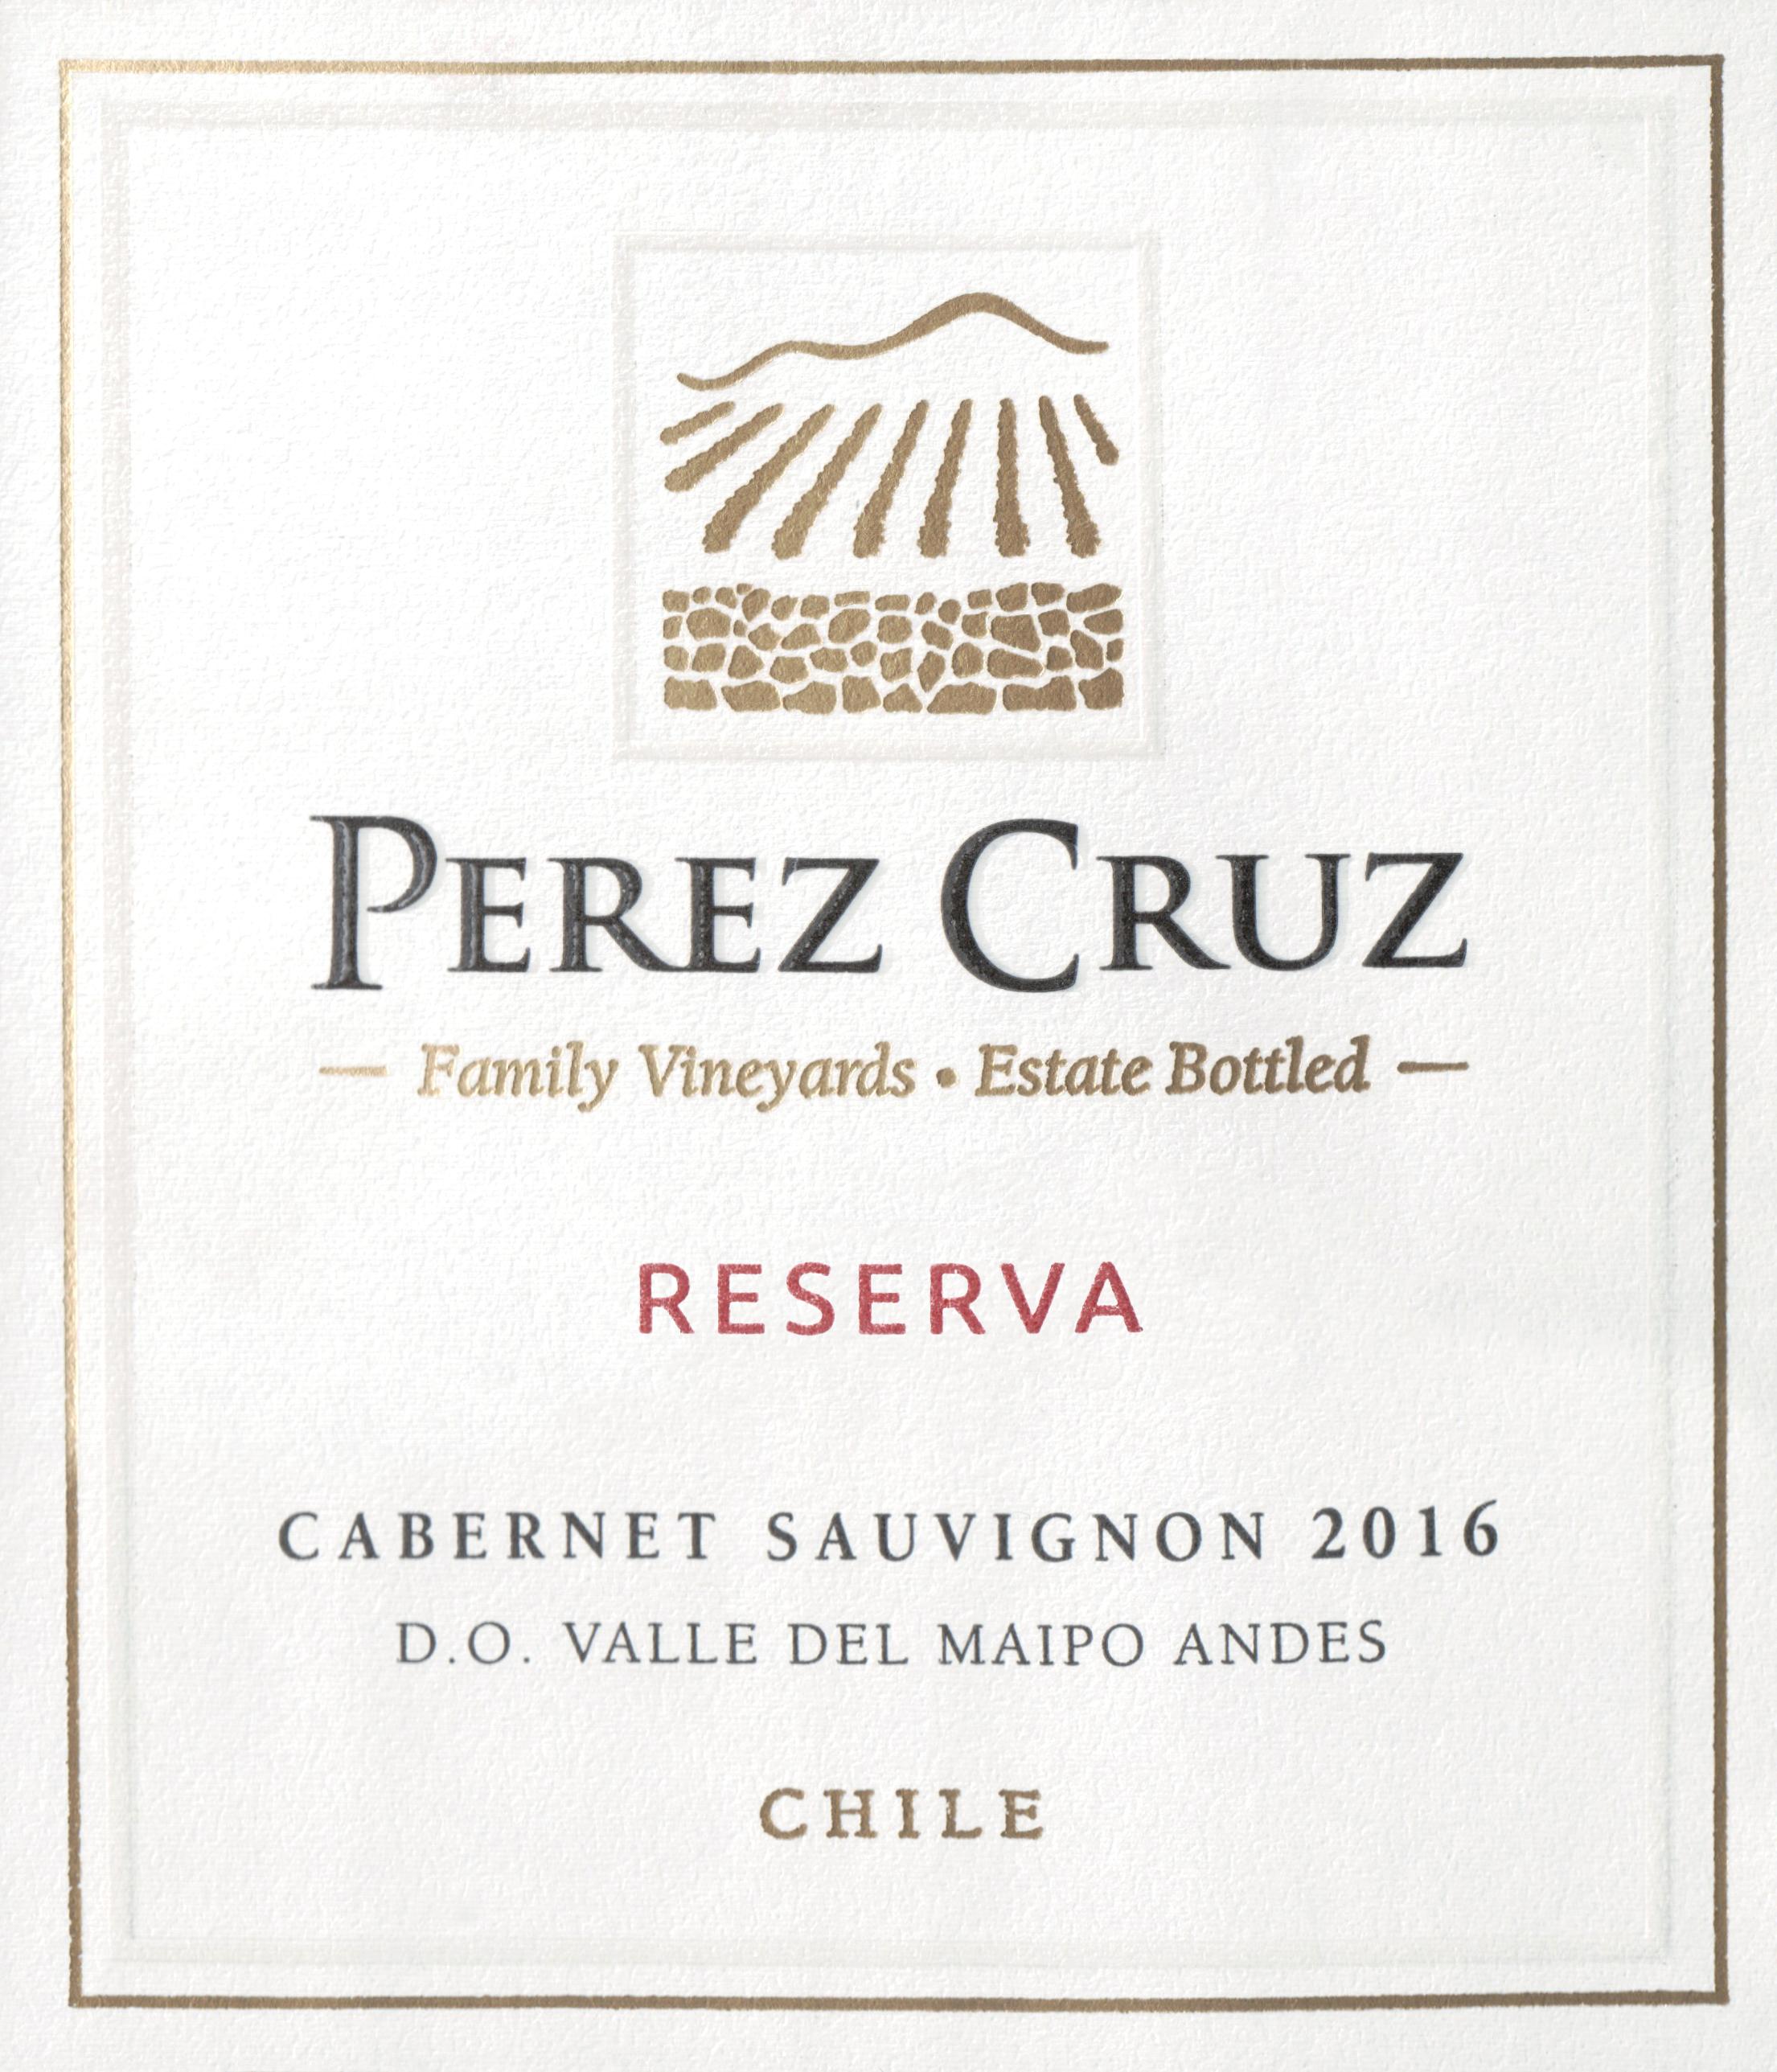 Perez Cruz Reserva Cabernet Sauvignon 2016